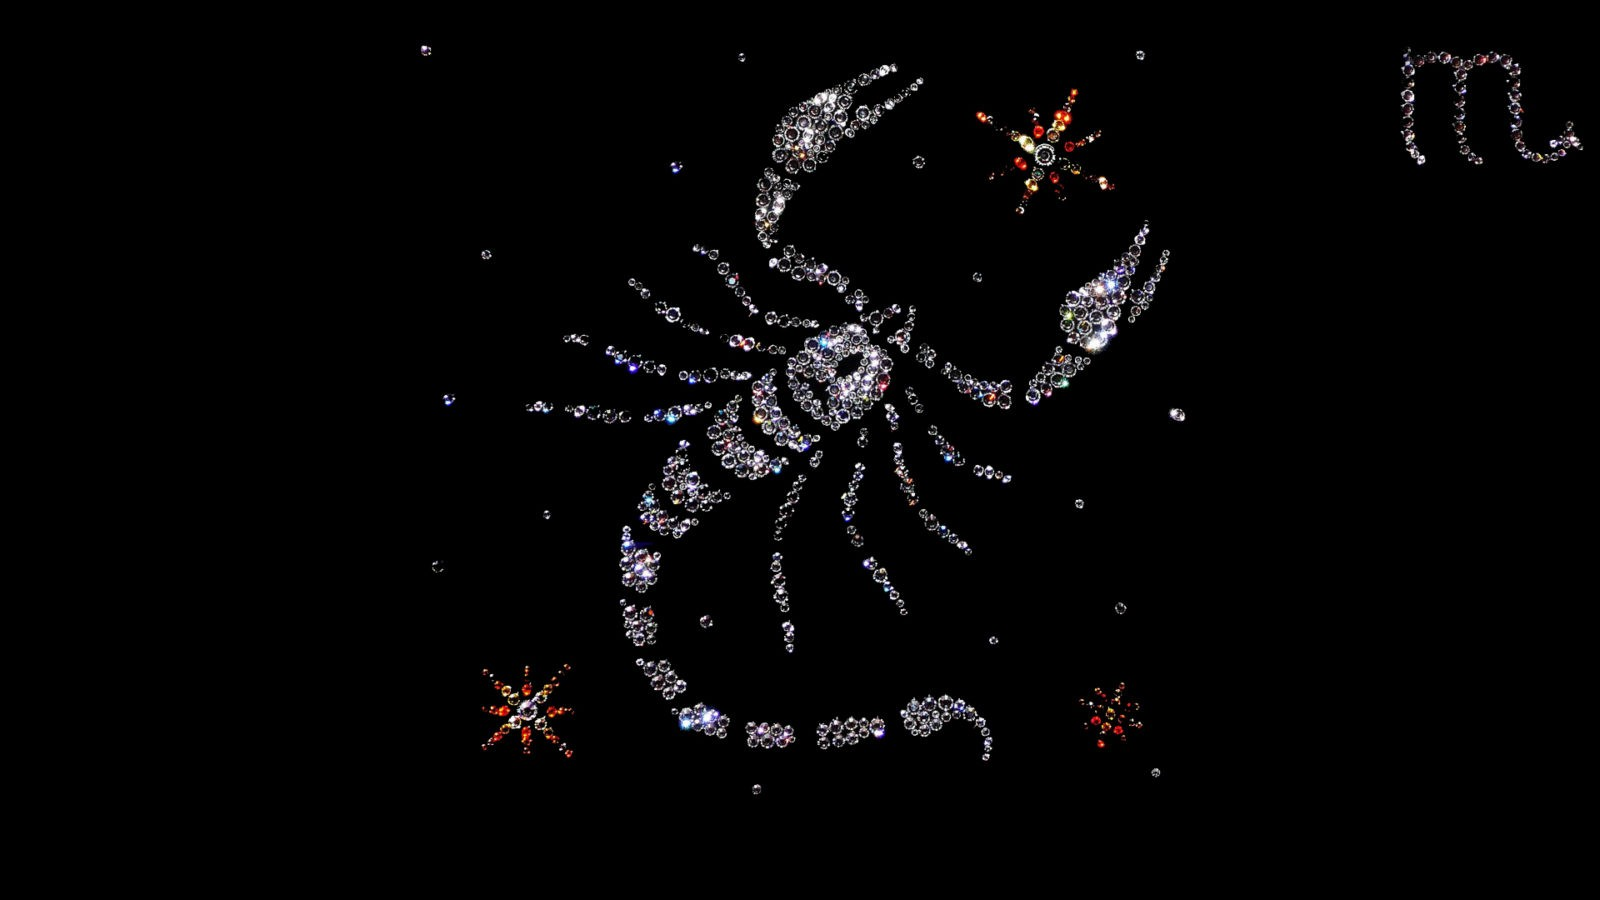 Камень для скорпиона — какой камень подходит знакам зодиака скорпион